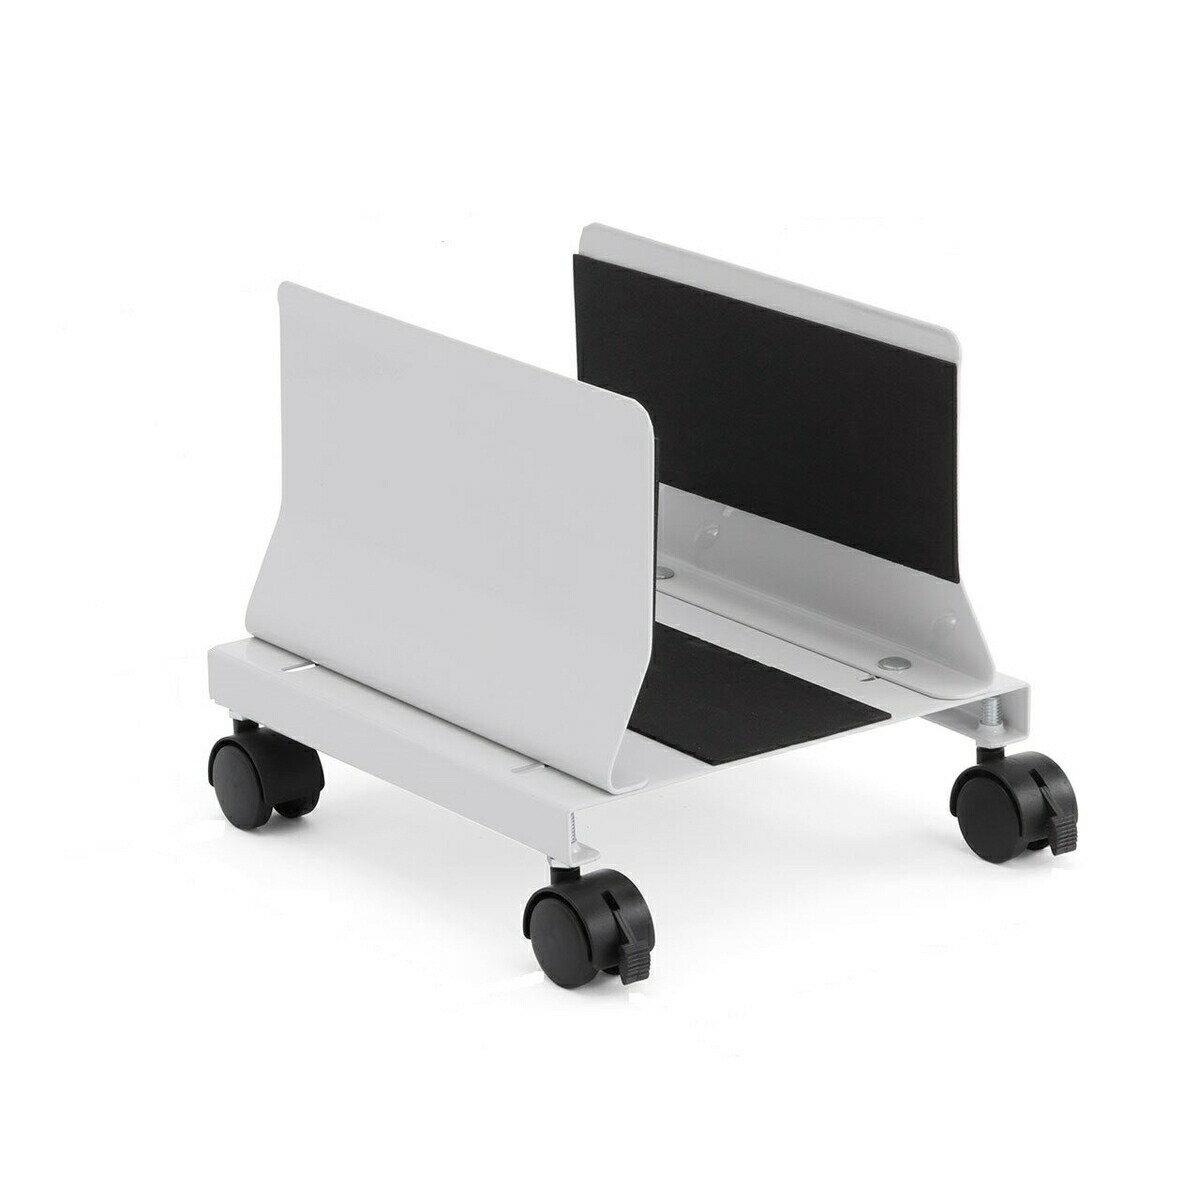 CPUスタンド デスクトップ用 パソコン本体設置用 キャスター付き 幅13.2cm〜22cm 無段階調節 スチール製 パソコンスタンド[100-CPU003]【サンワダイレクト限定品】